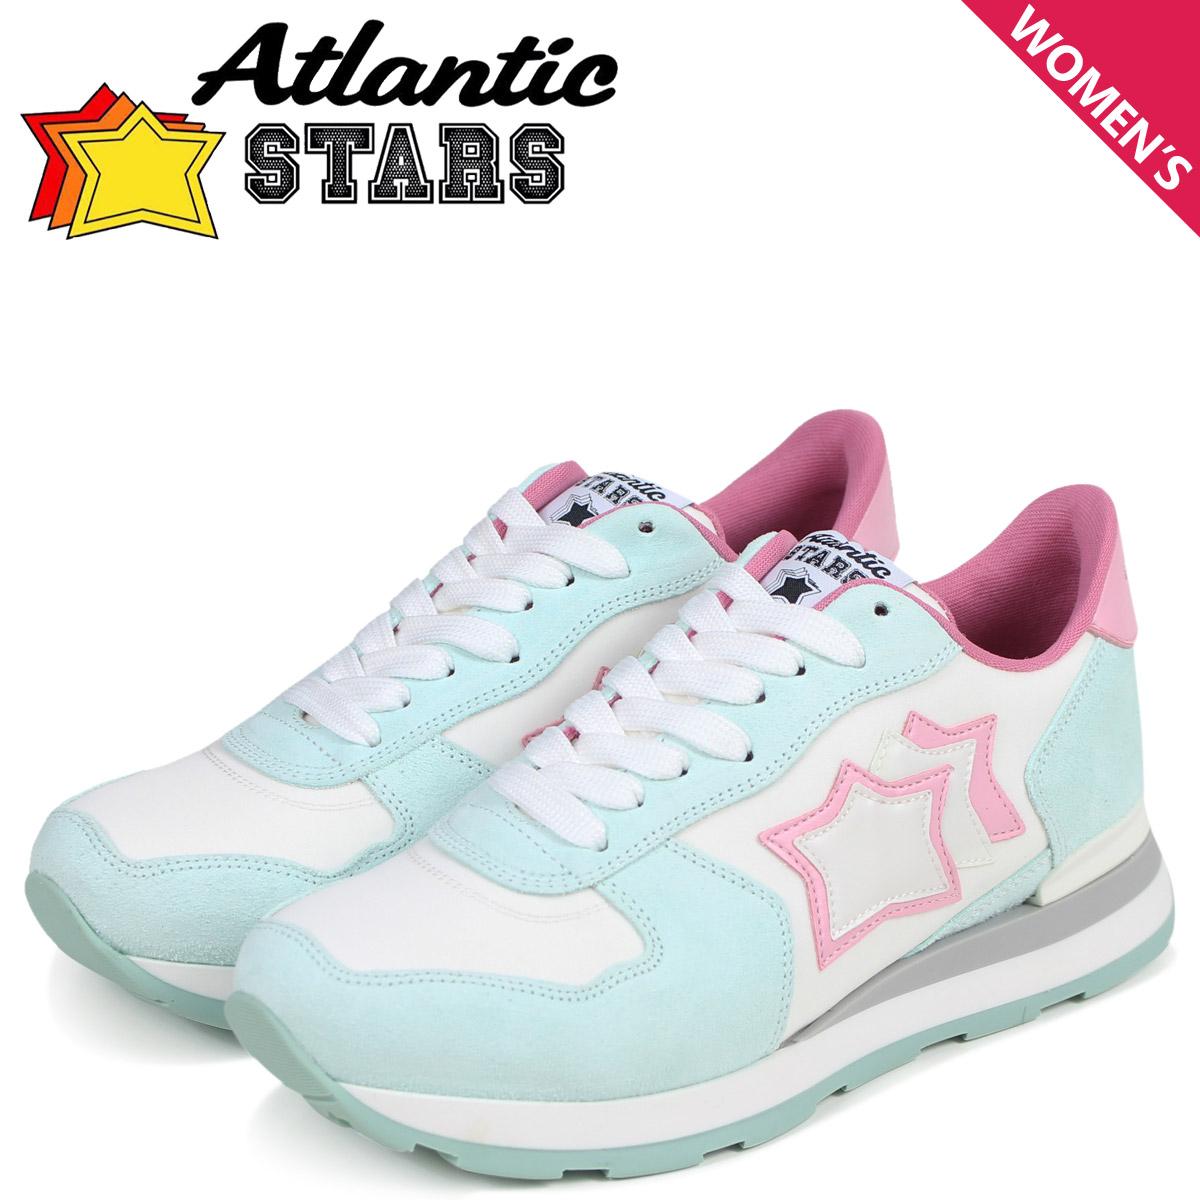 Atlantic STARS アトランティックスターズ レディース スニーカー ベガ VEGA BMR28B ライトブルー